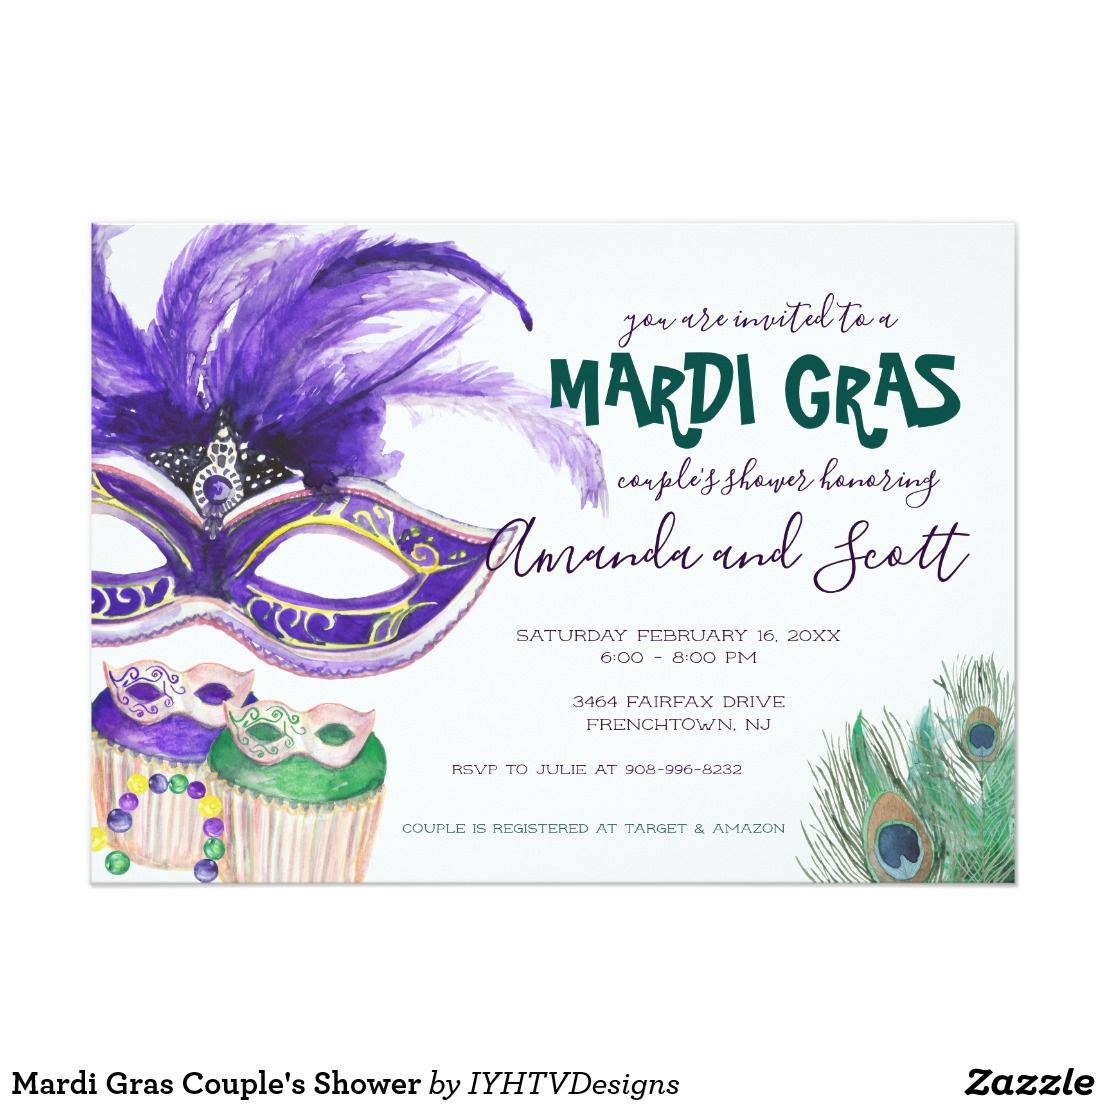 Mardi Gras Bridal Shower Wedding Shower By Classyyetsassyinvite 10 00 Bridal Shower Bridal Shower Decorations Diy Bridal Shower Centerpieces